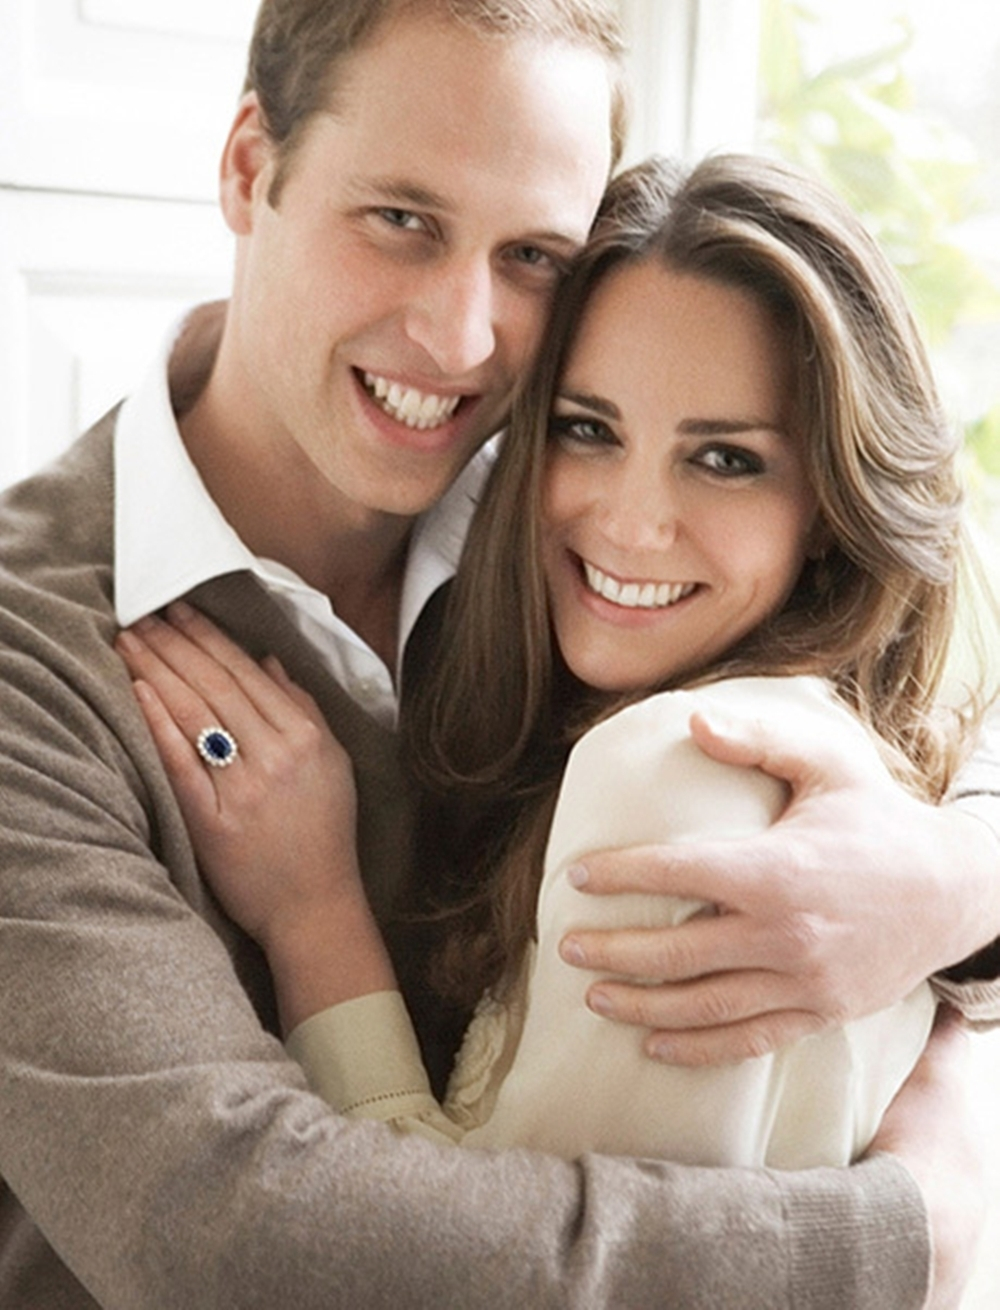 https://i2.wp.com/images4.fanpop.com/image/photos/18800000/William-Kate-prince-william-and-kate-middleton-18854456-1000-1310.jpg